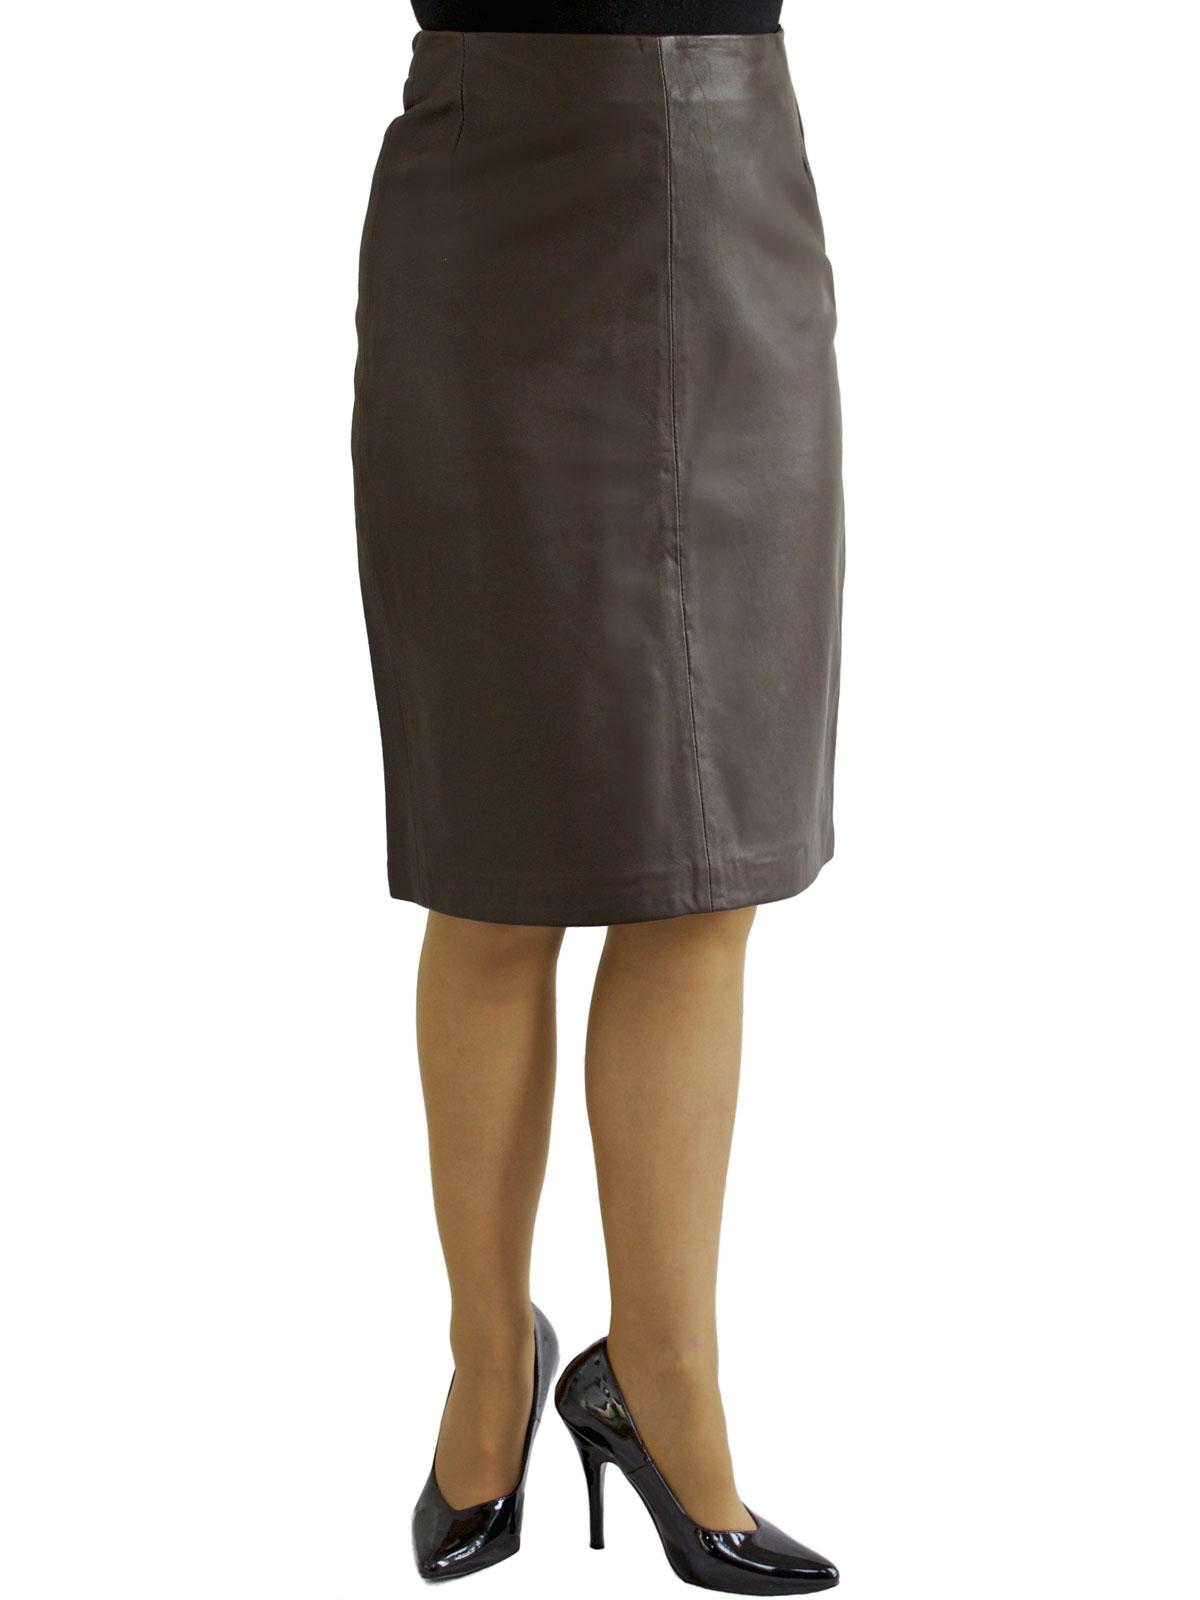 Luxury Leather Pencil Skirt with back split - Tout Ensemble